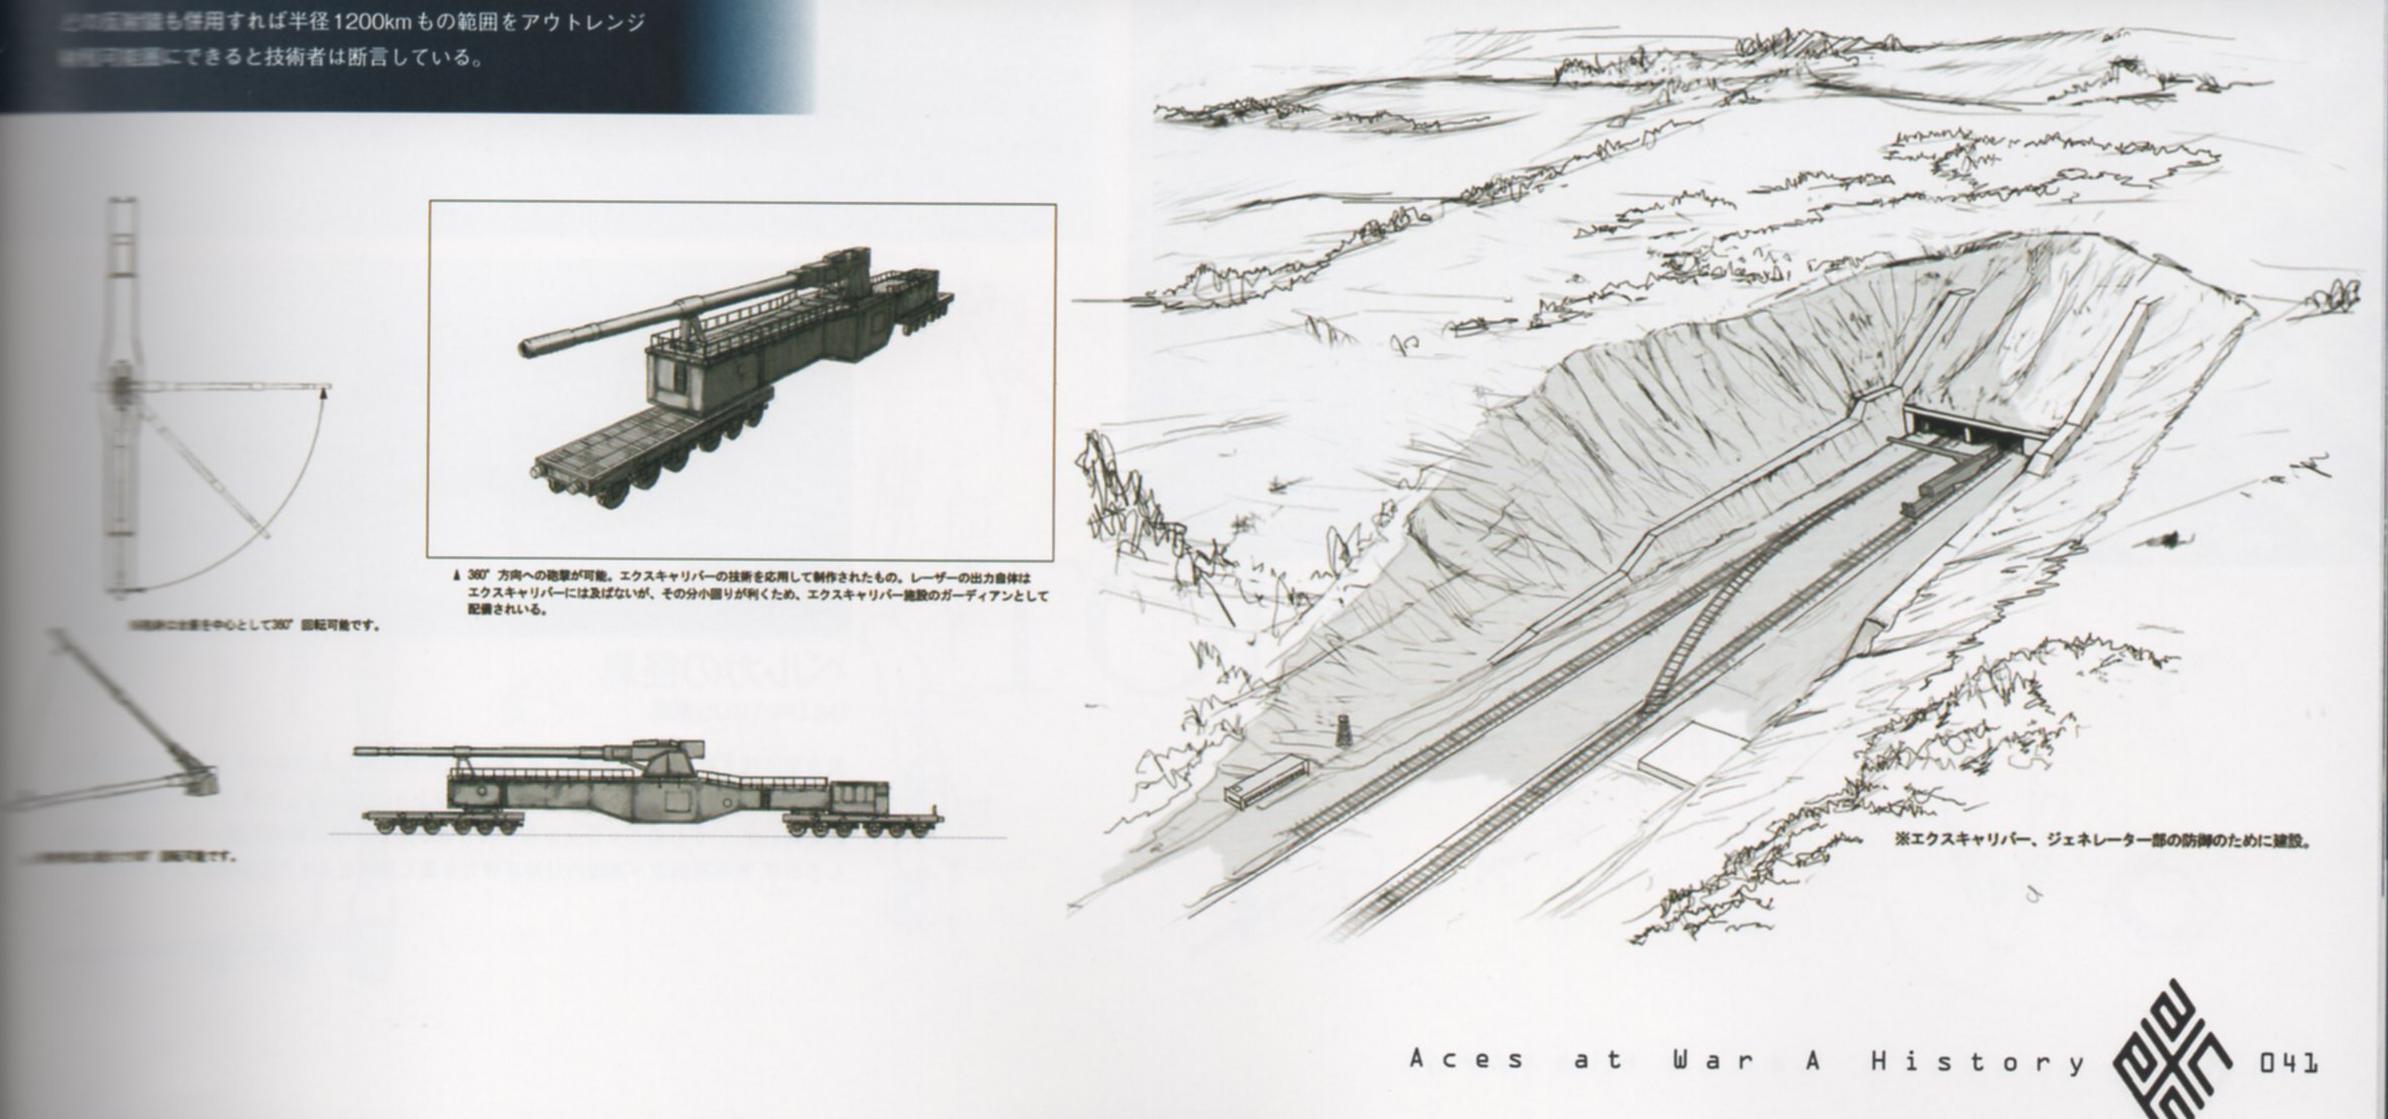 Ace Combat Zero The Belkan War Part 9 Mission 9 Operation